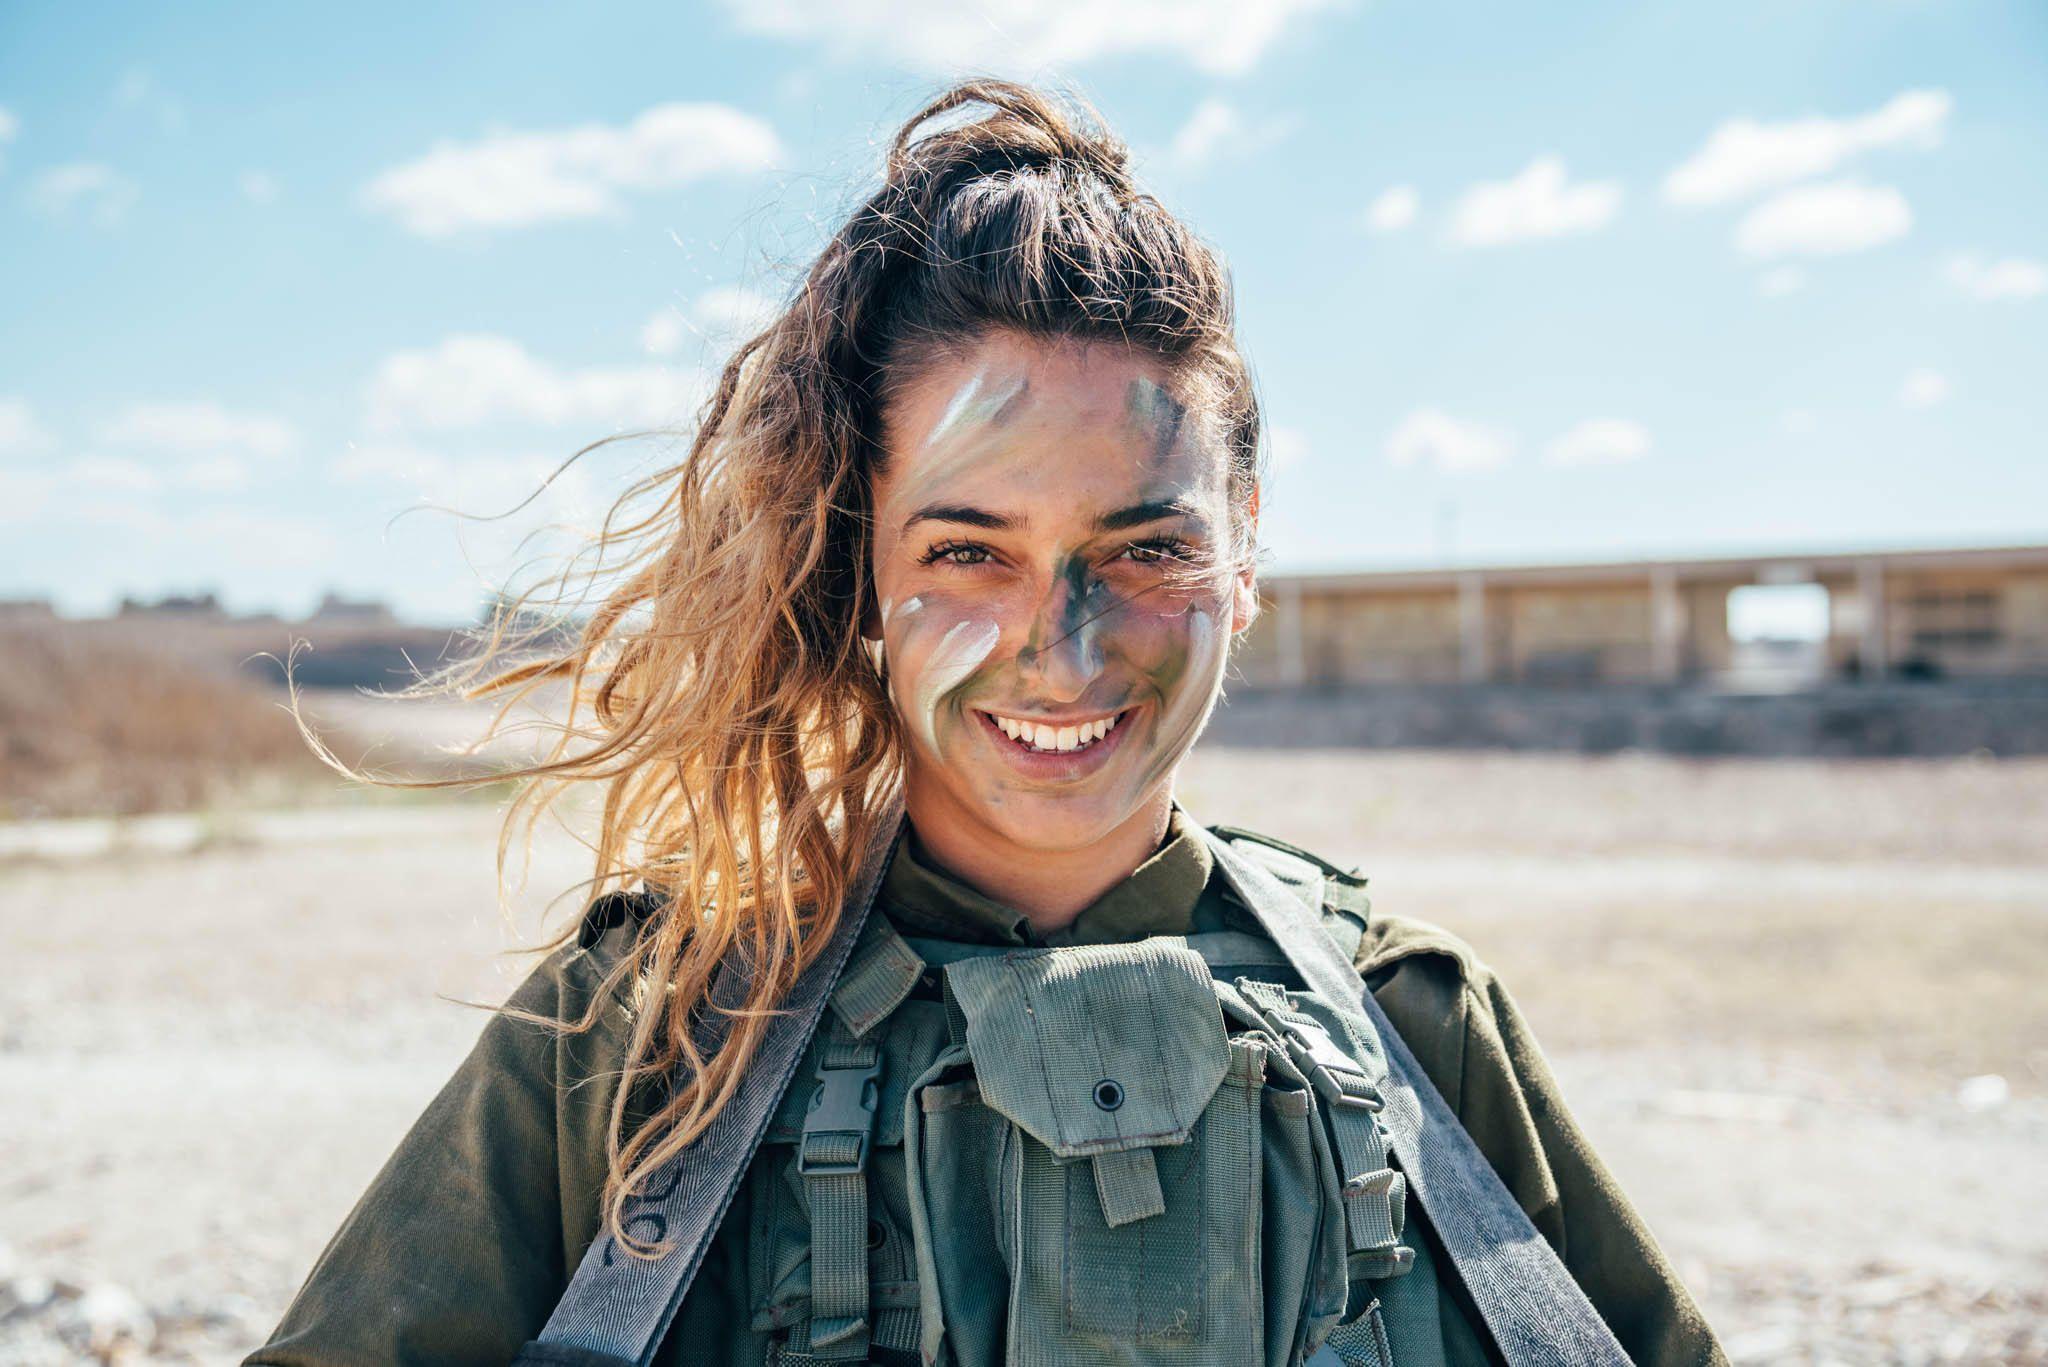 Women of the IDF [1266x845]